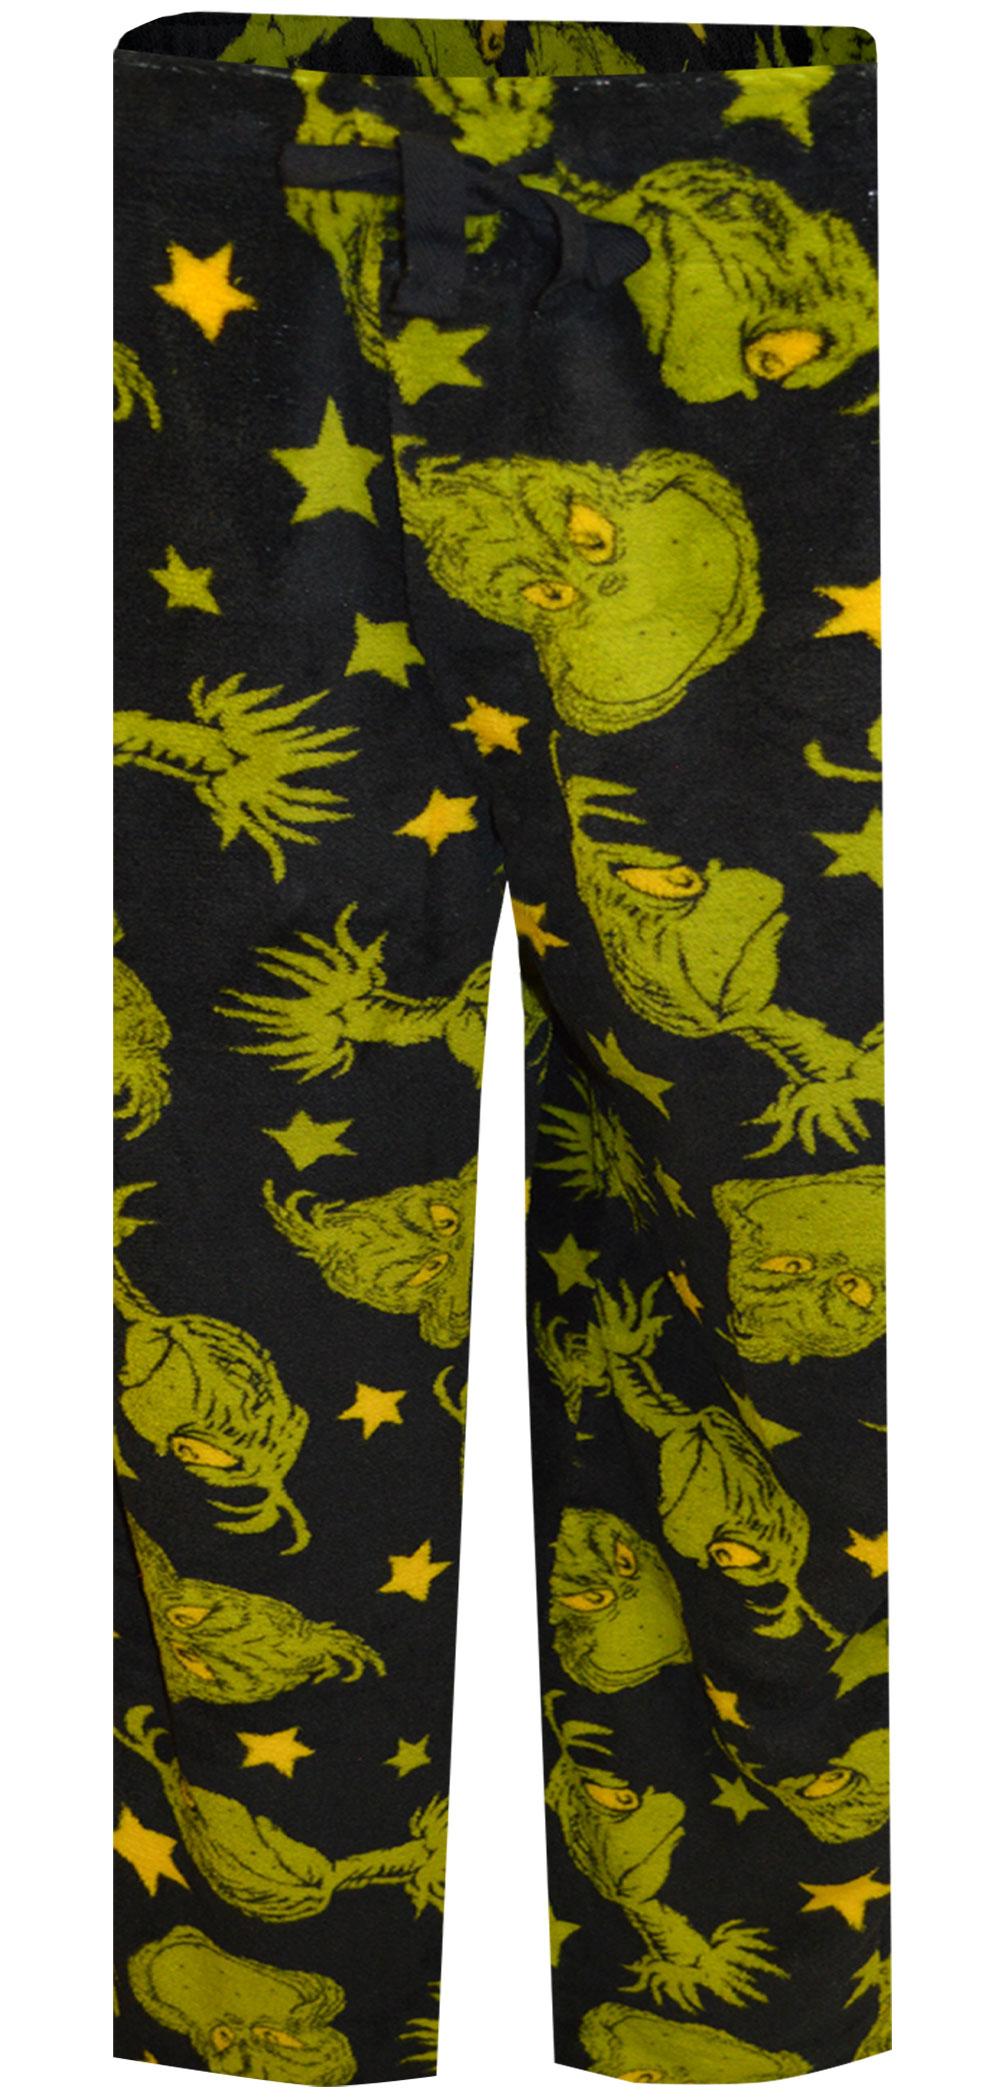 Image of Dr. Seuss The Grinch Plush Lounge Pants for men